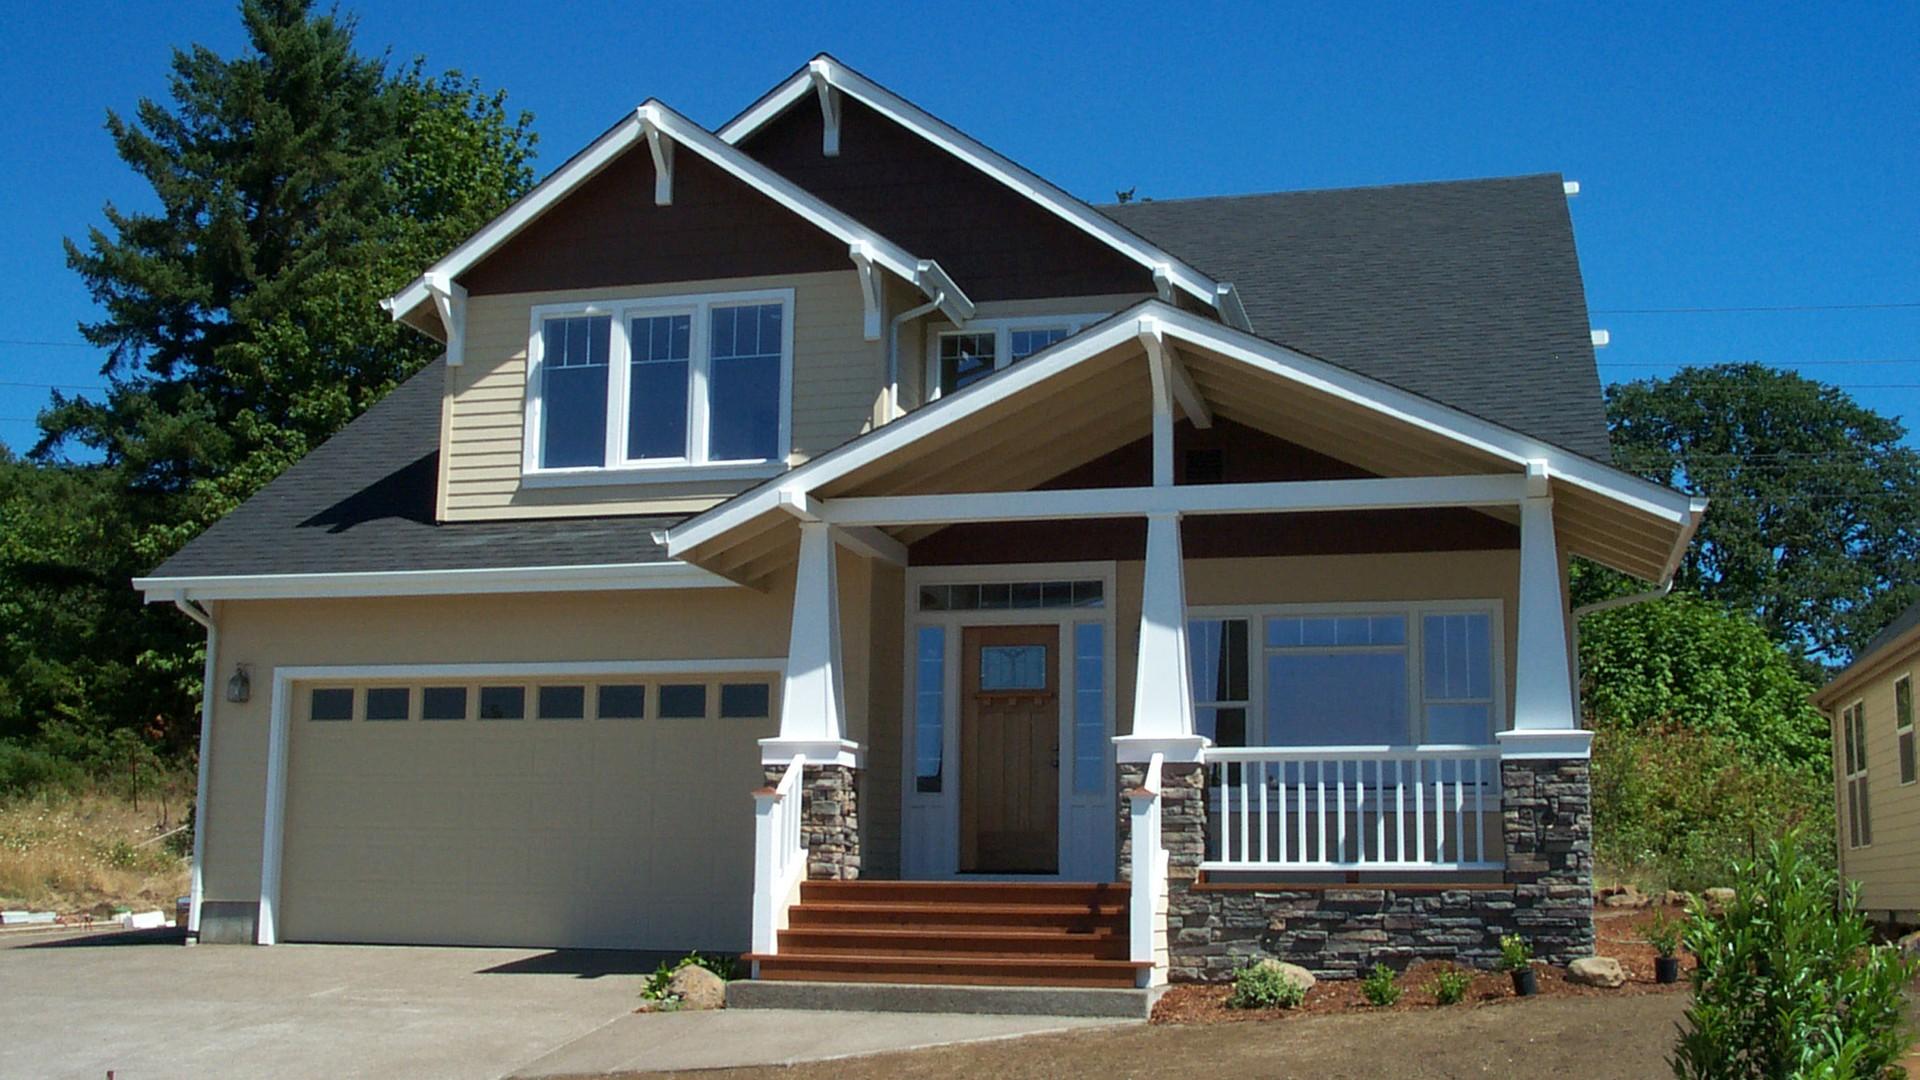 Details home design visit simply elegant designs type Simply elegant house plans